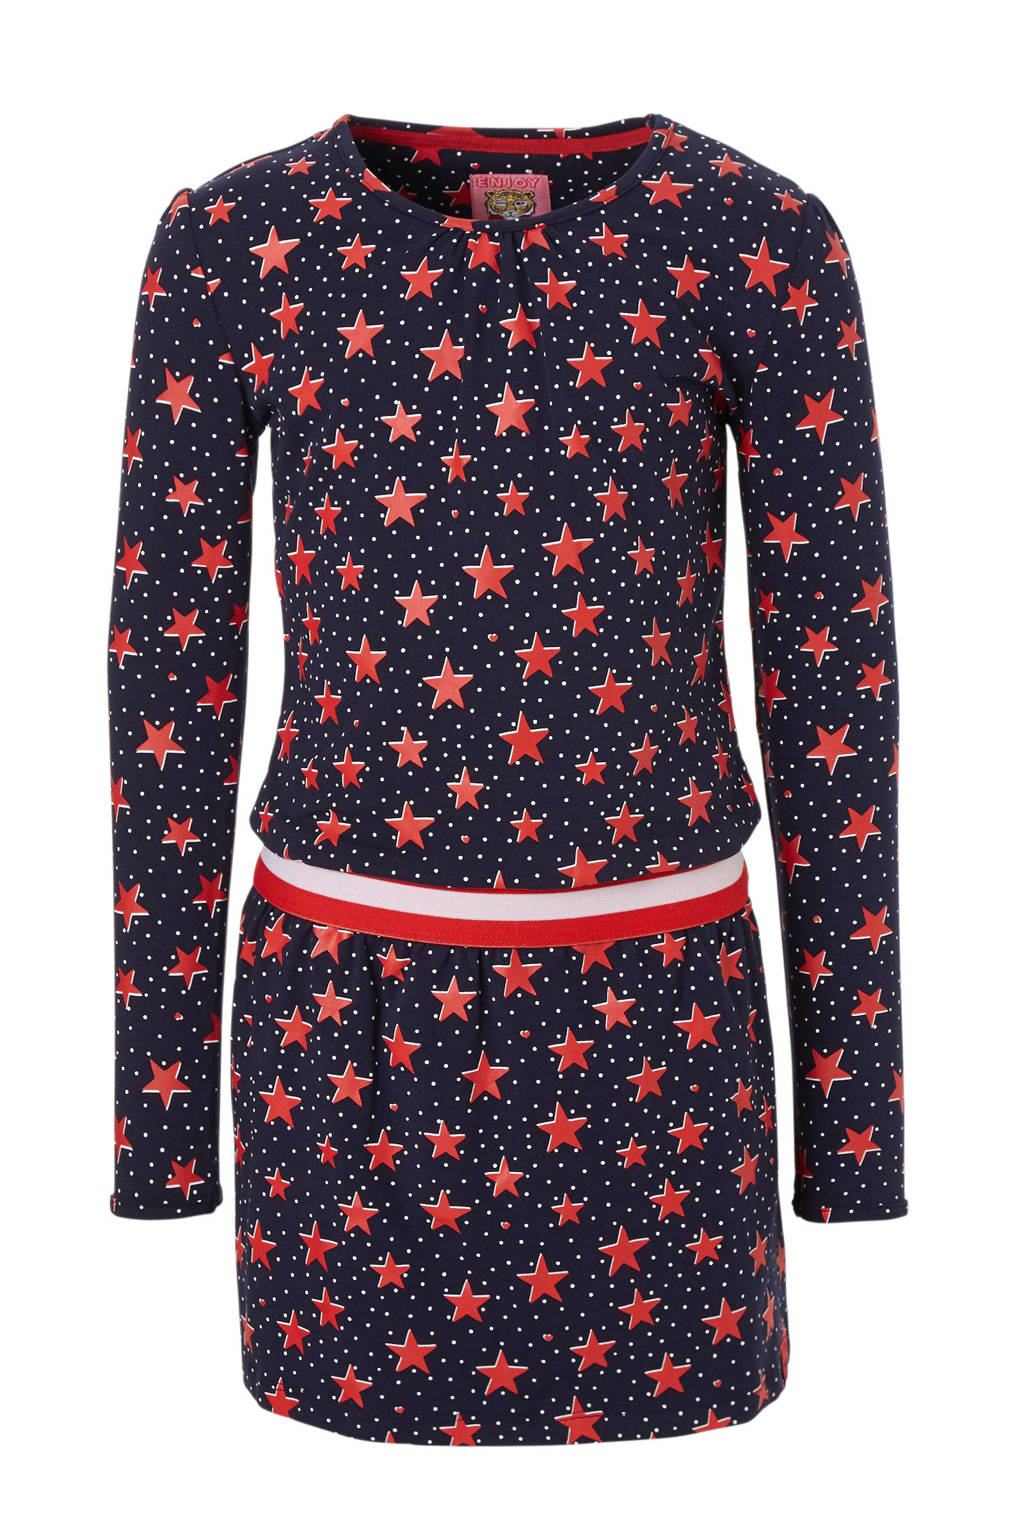 Z8 jurk met sterren blauw/rood/wit, Blauw/rood/wit